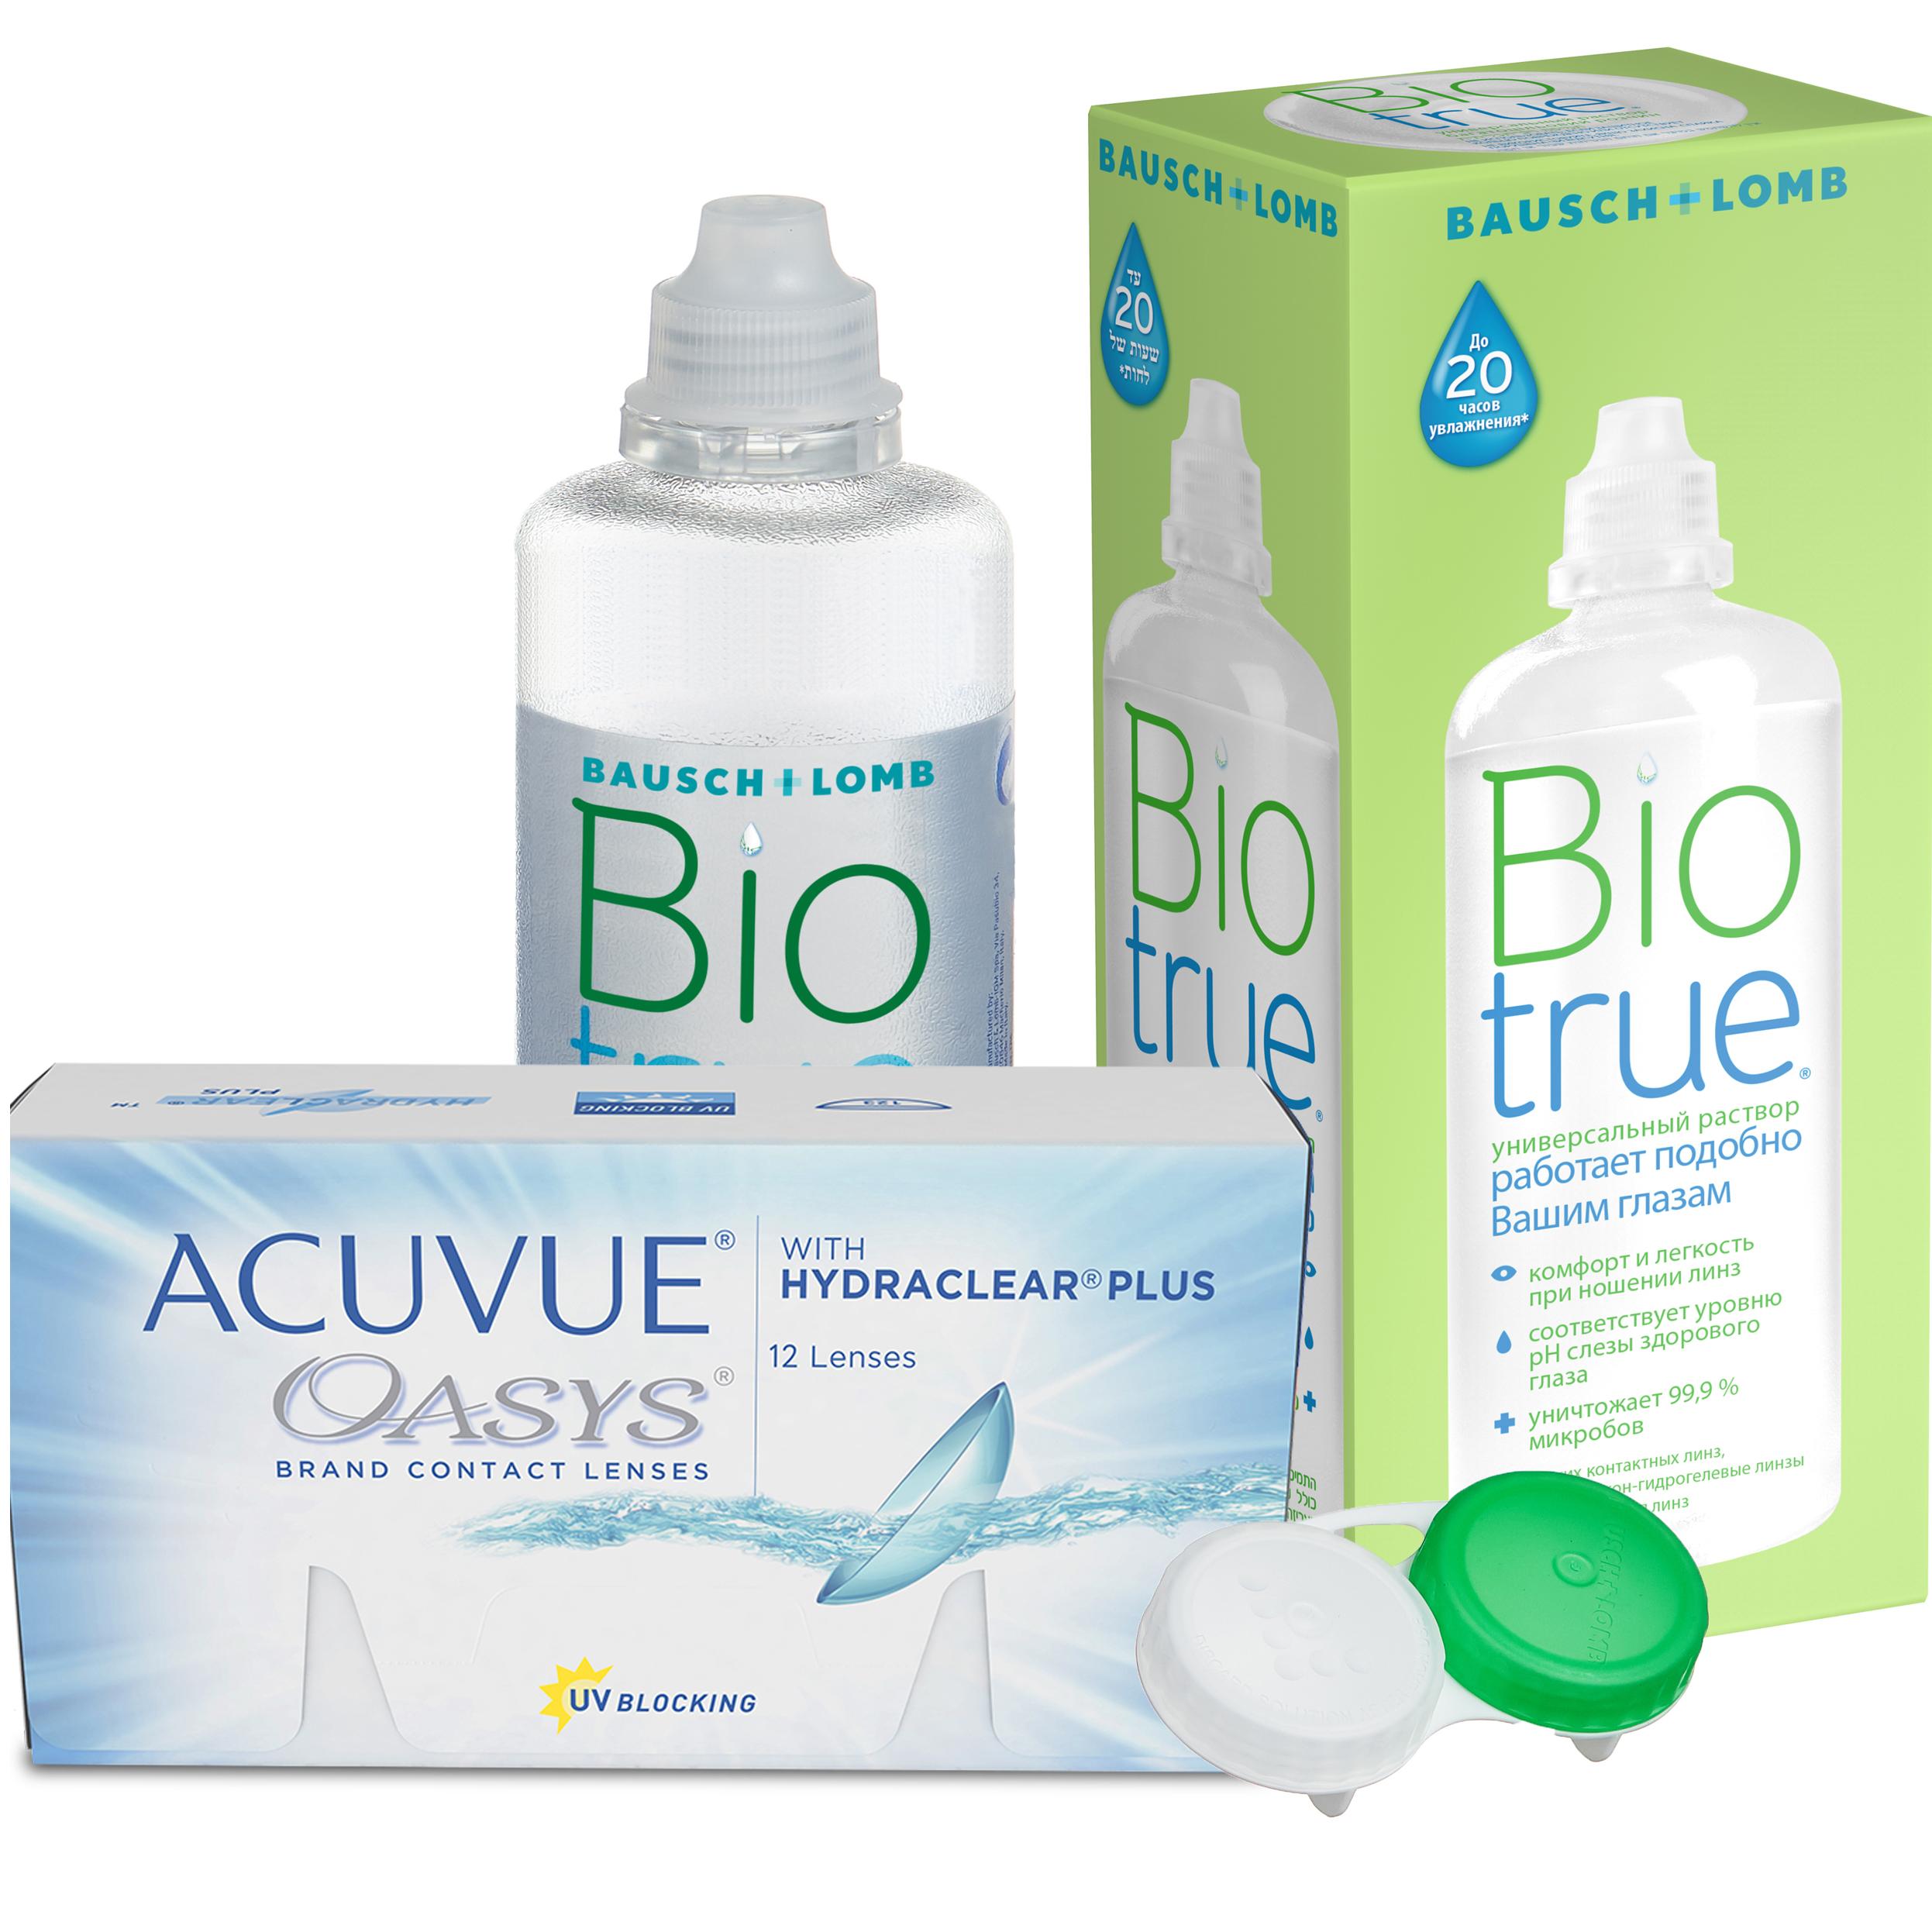 Купить Oasys with Hydraclear Plus 12 линз + Biotrue, Контактные линзы Acuvue Oasys with Hydraclear Plus 12 линз R 8.8 +5, 25 + Biotrue 300 мл